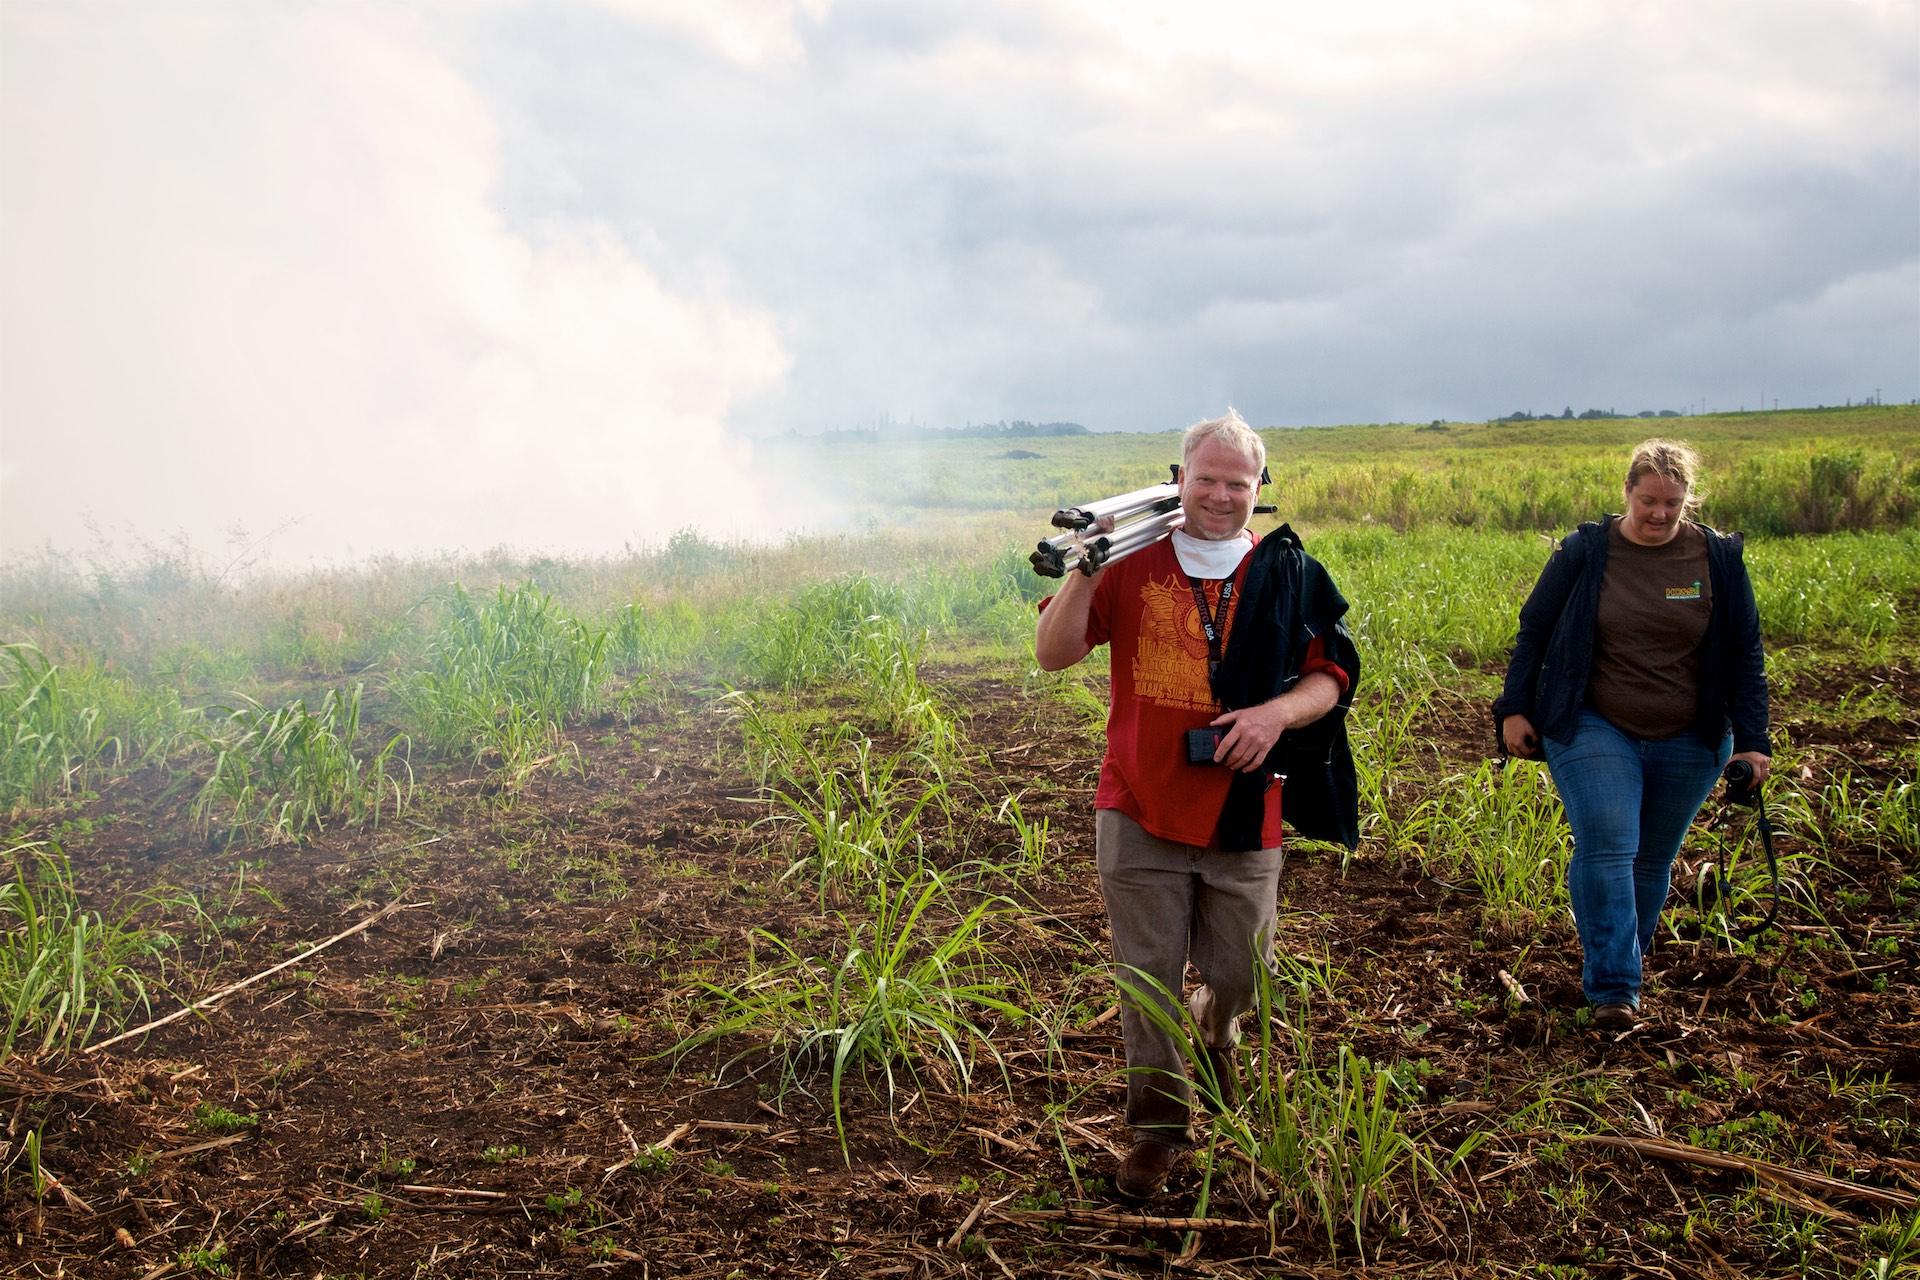 Director Danny Miller and Hilary Bingman of Hawaiian Commercial & Sugar Company on Maui at a sugar cane burn before a harvest. Photo by Baron Sekiya